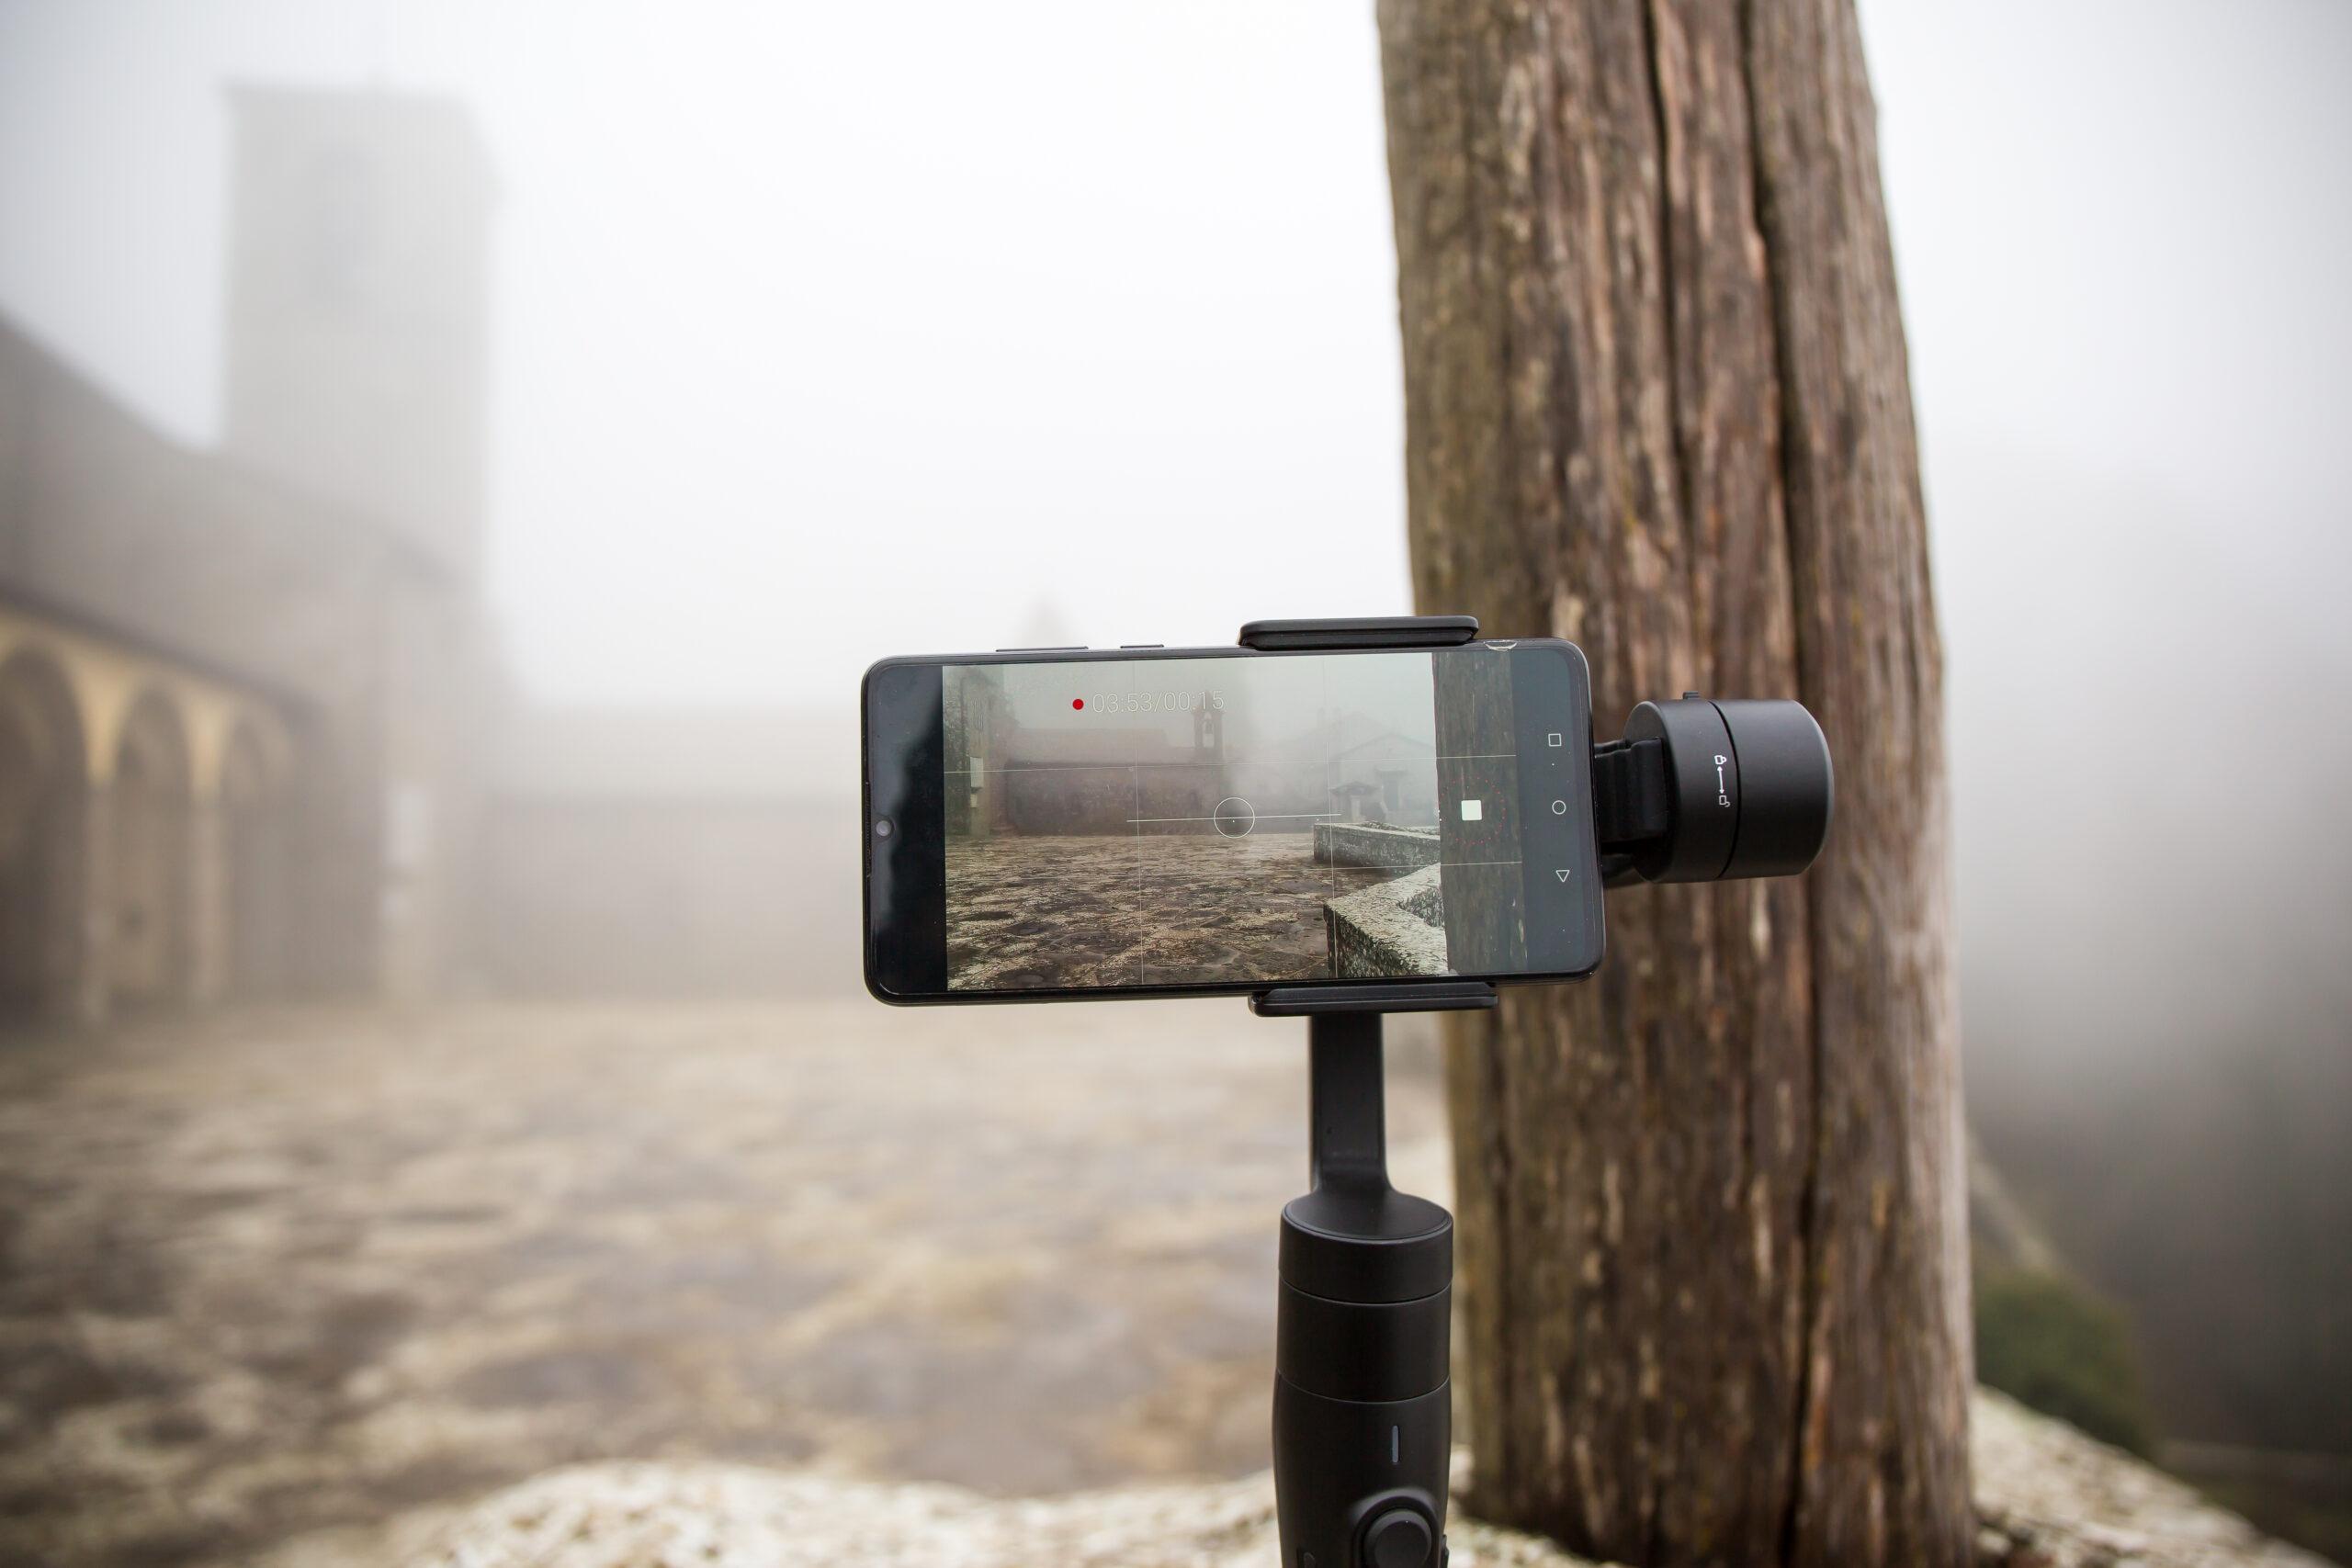 smartphone-la-verna-santuario